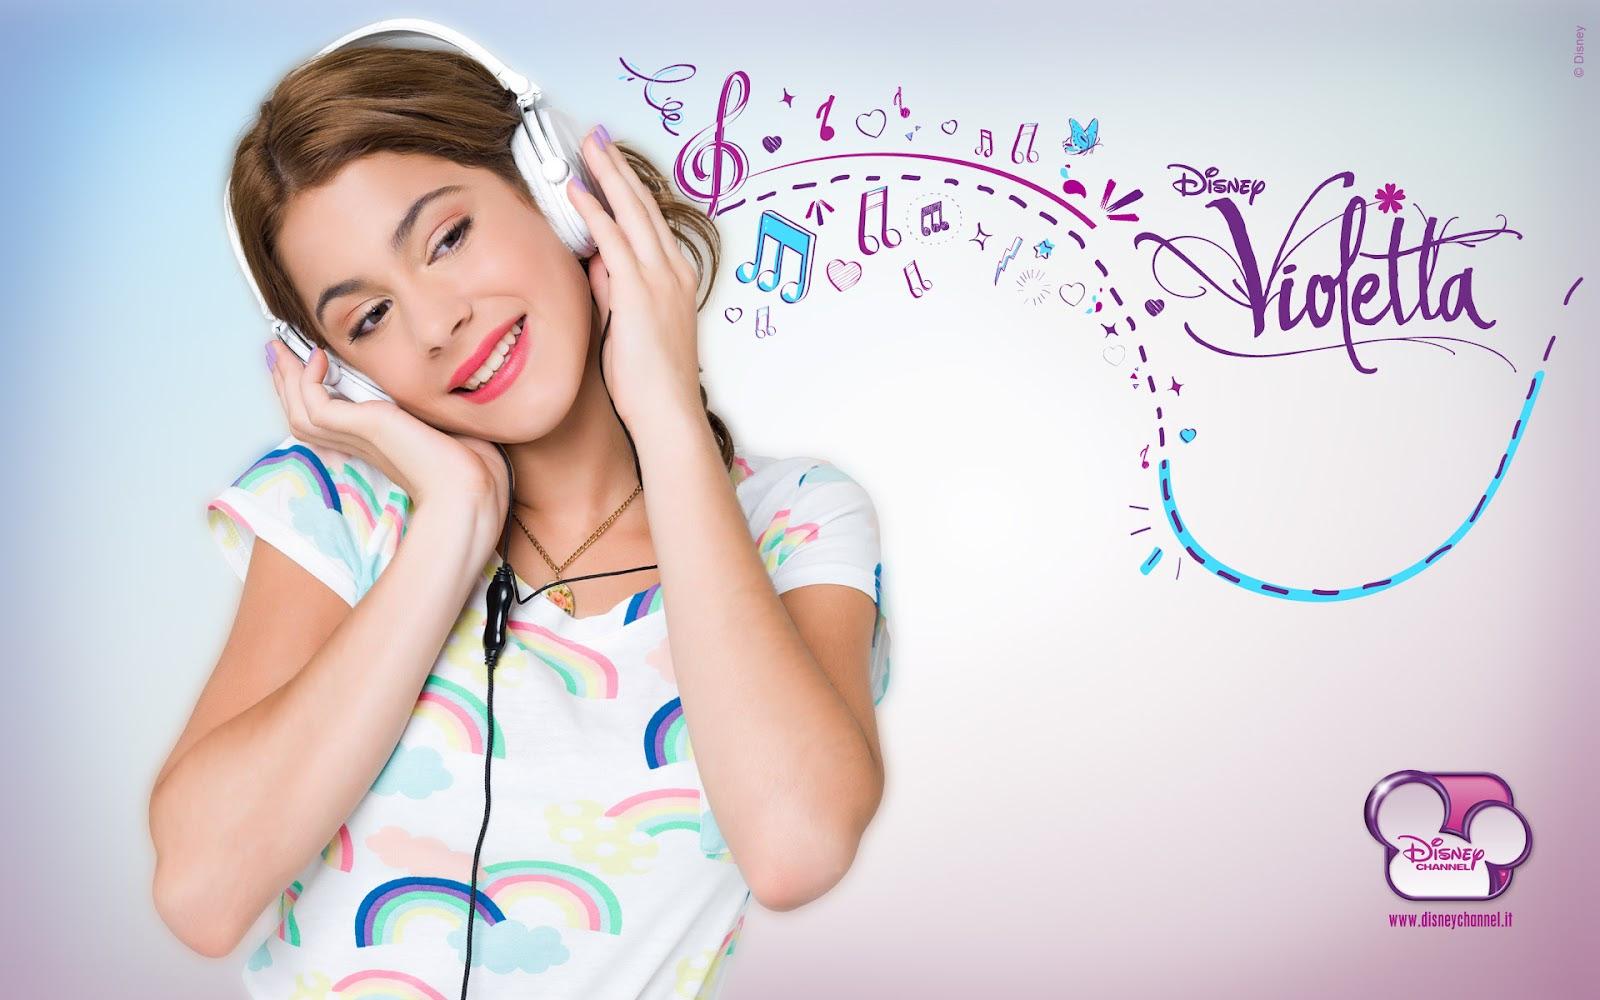 http://images6.fanpop.com/image/photos/32100000/Violetta-Wallpaper-violetta-32130068-1600-1000.jpg